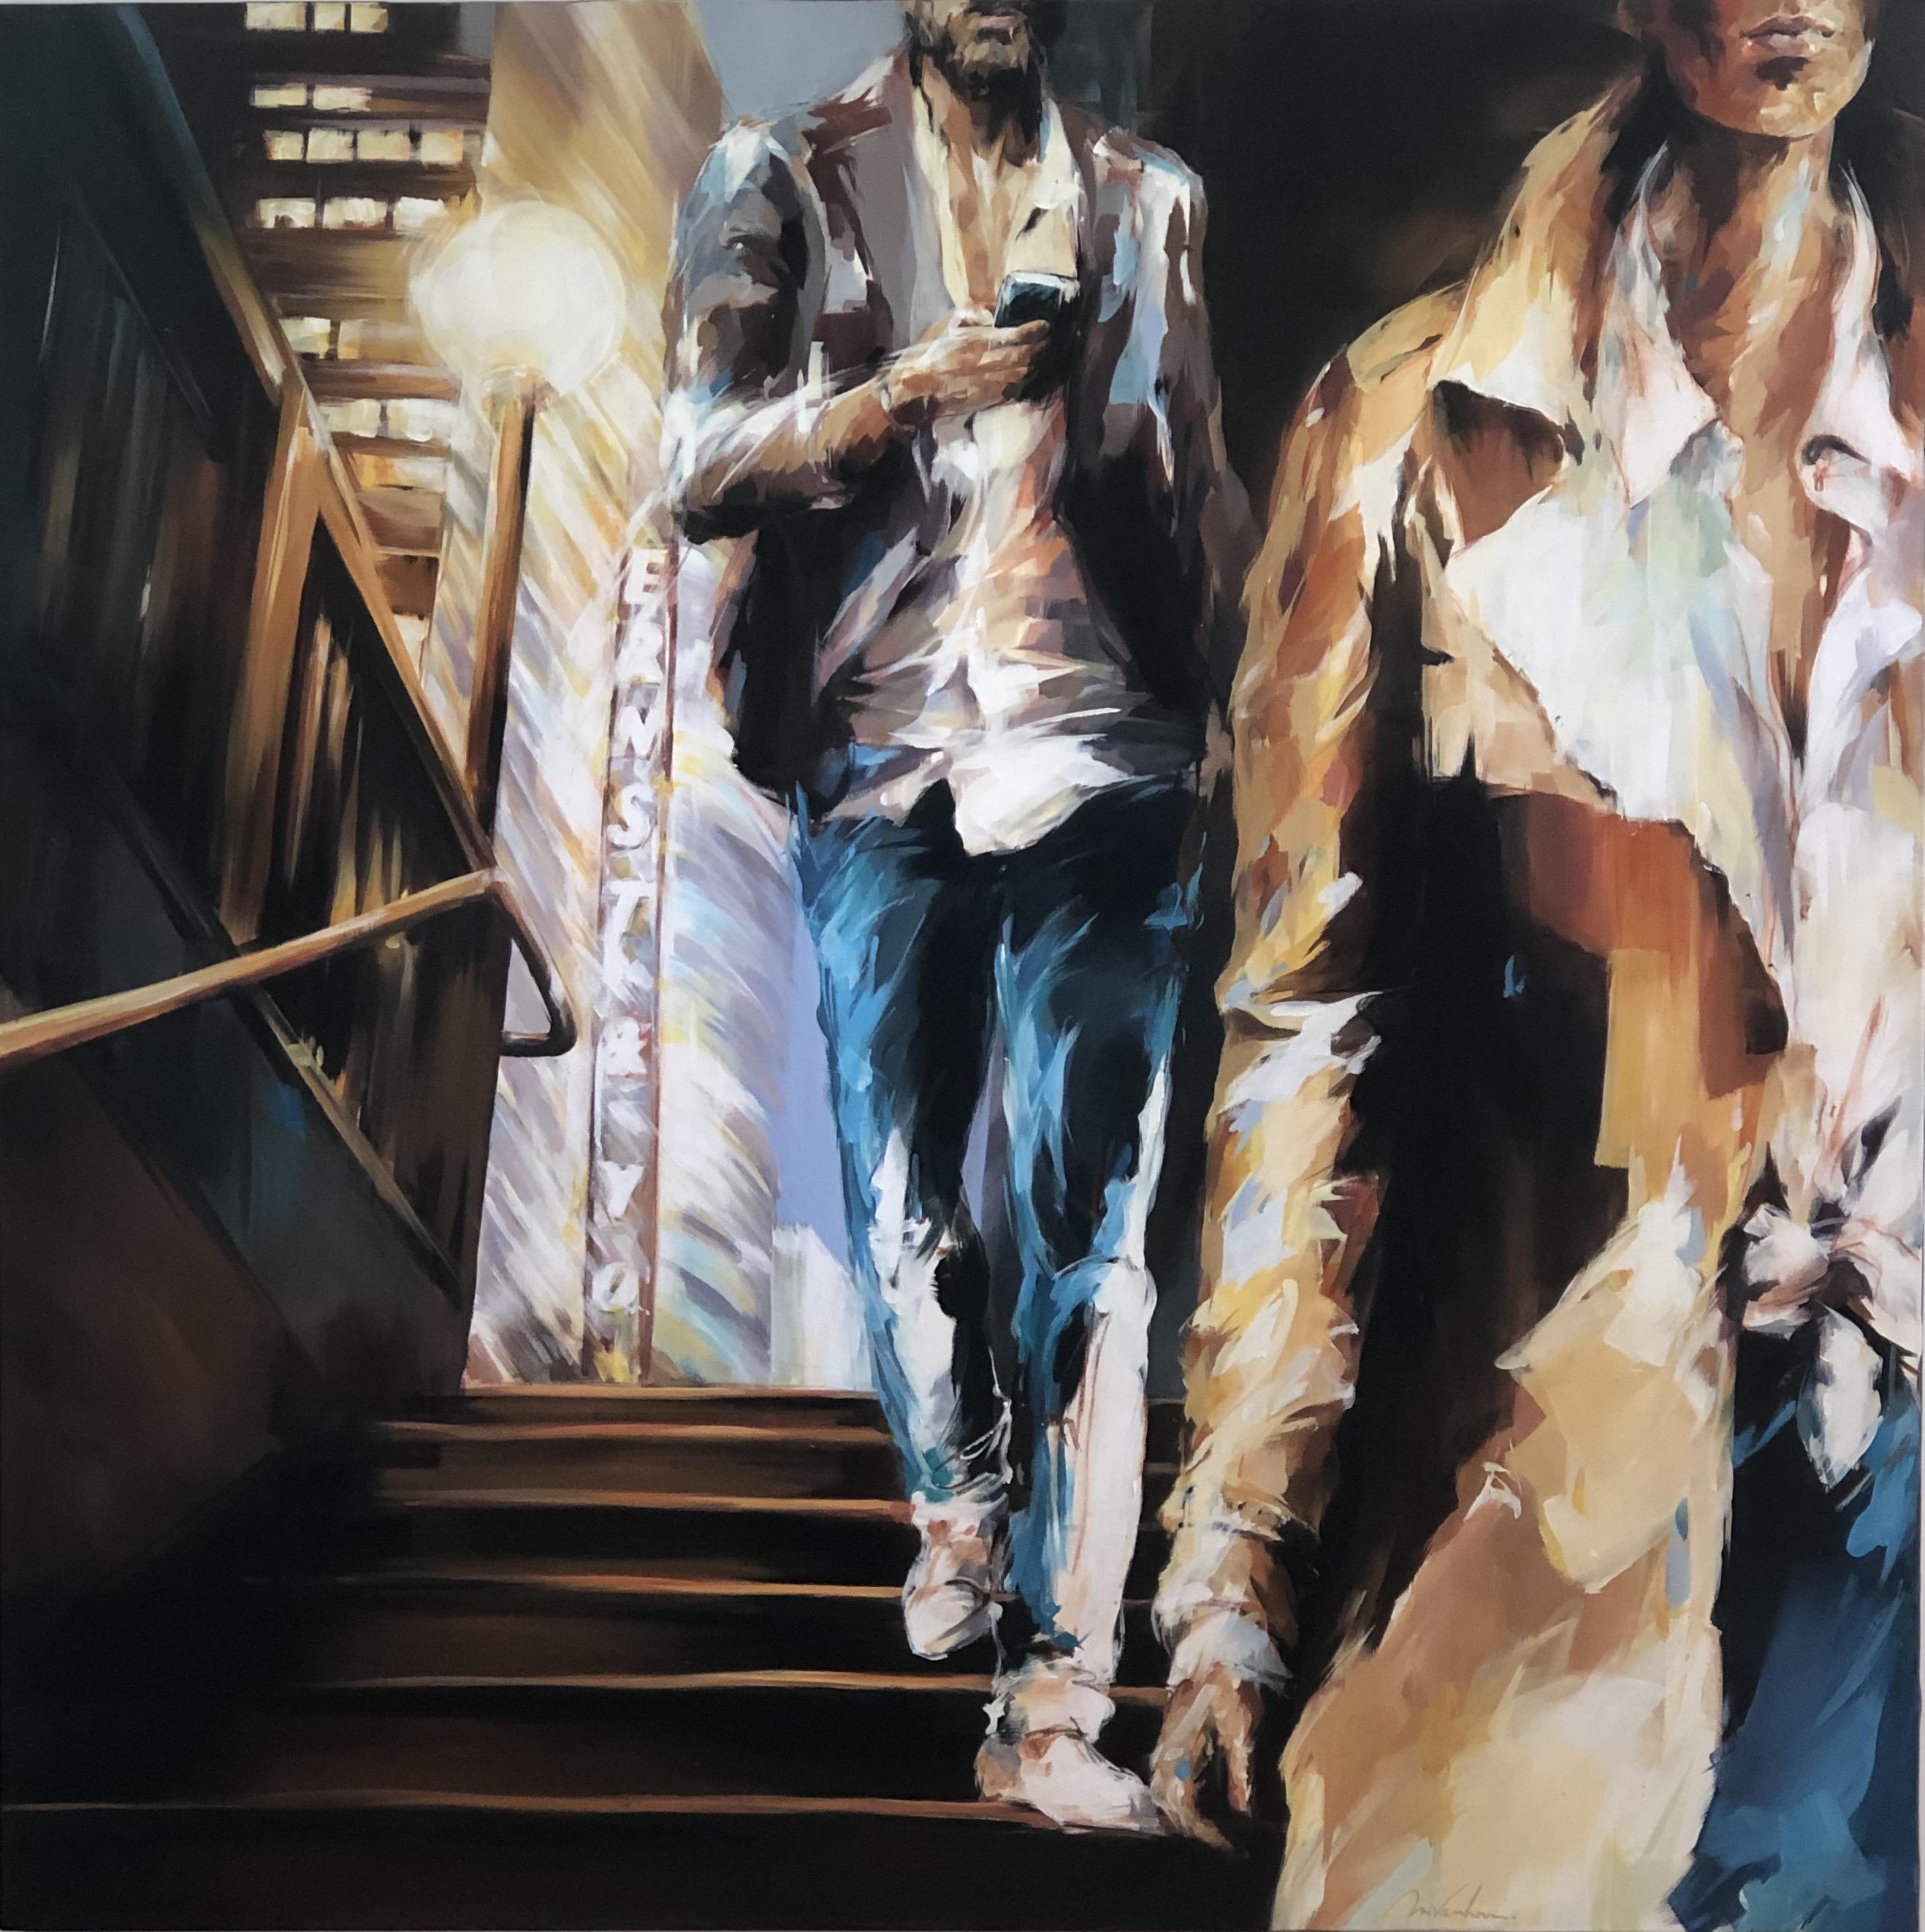 Range-of-Arts-Painting-Murielle-Vanhove-Elles-Metro-120x120cm